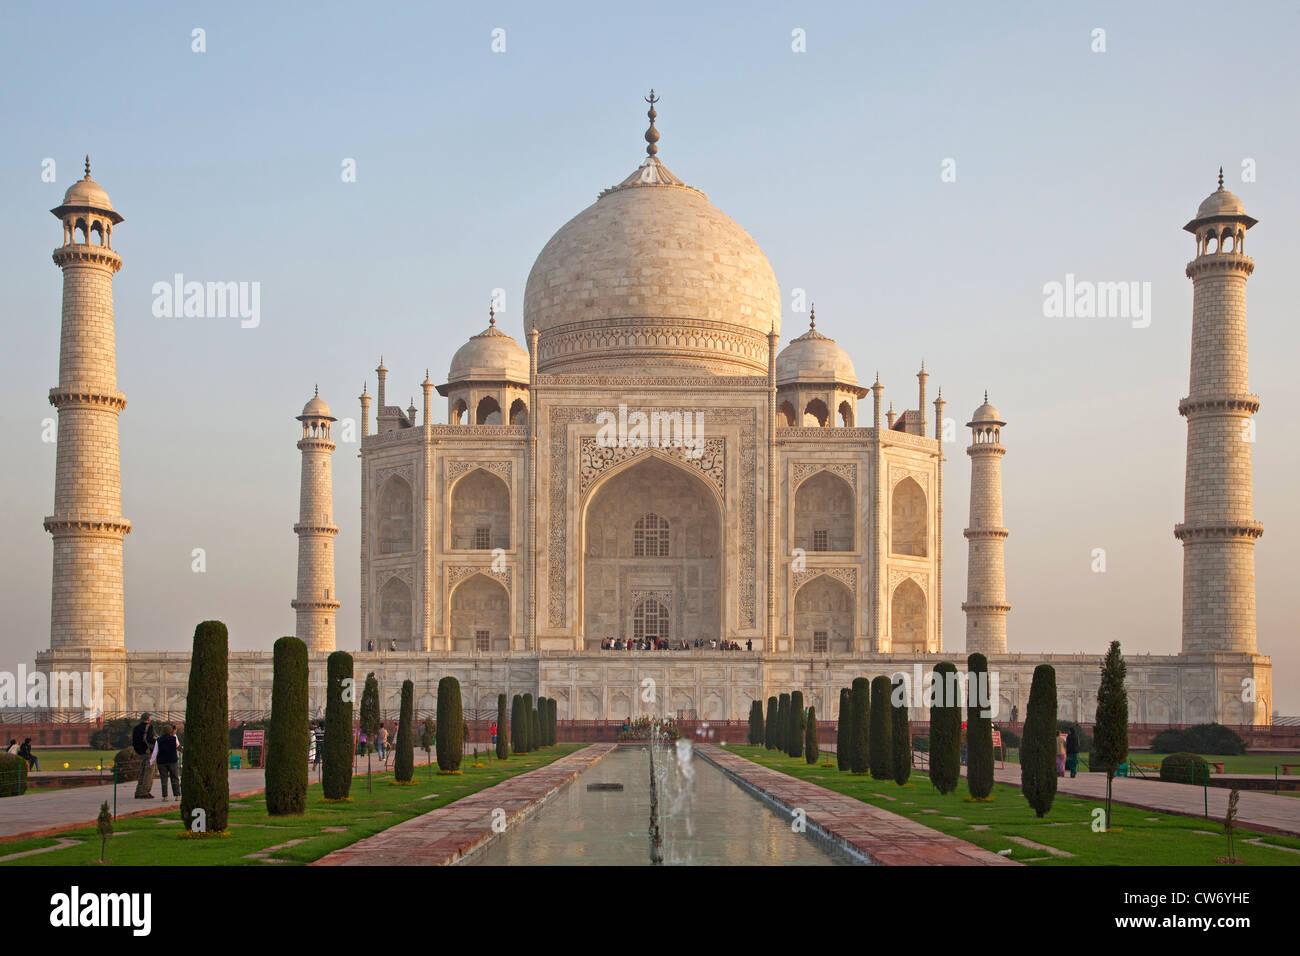 Tourists visiting the Taj Mahal, white marble palace in Agra, Uttar Pradesh, India - Stock Image